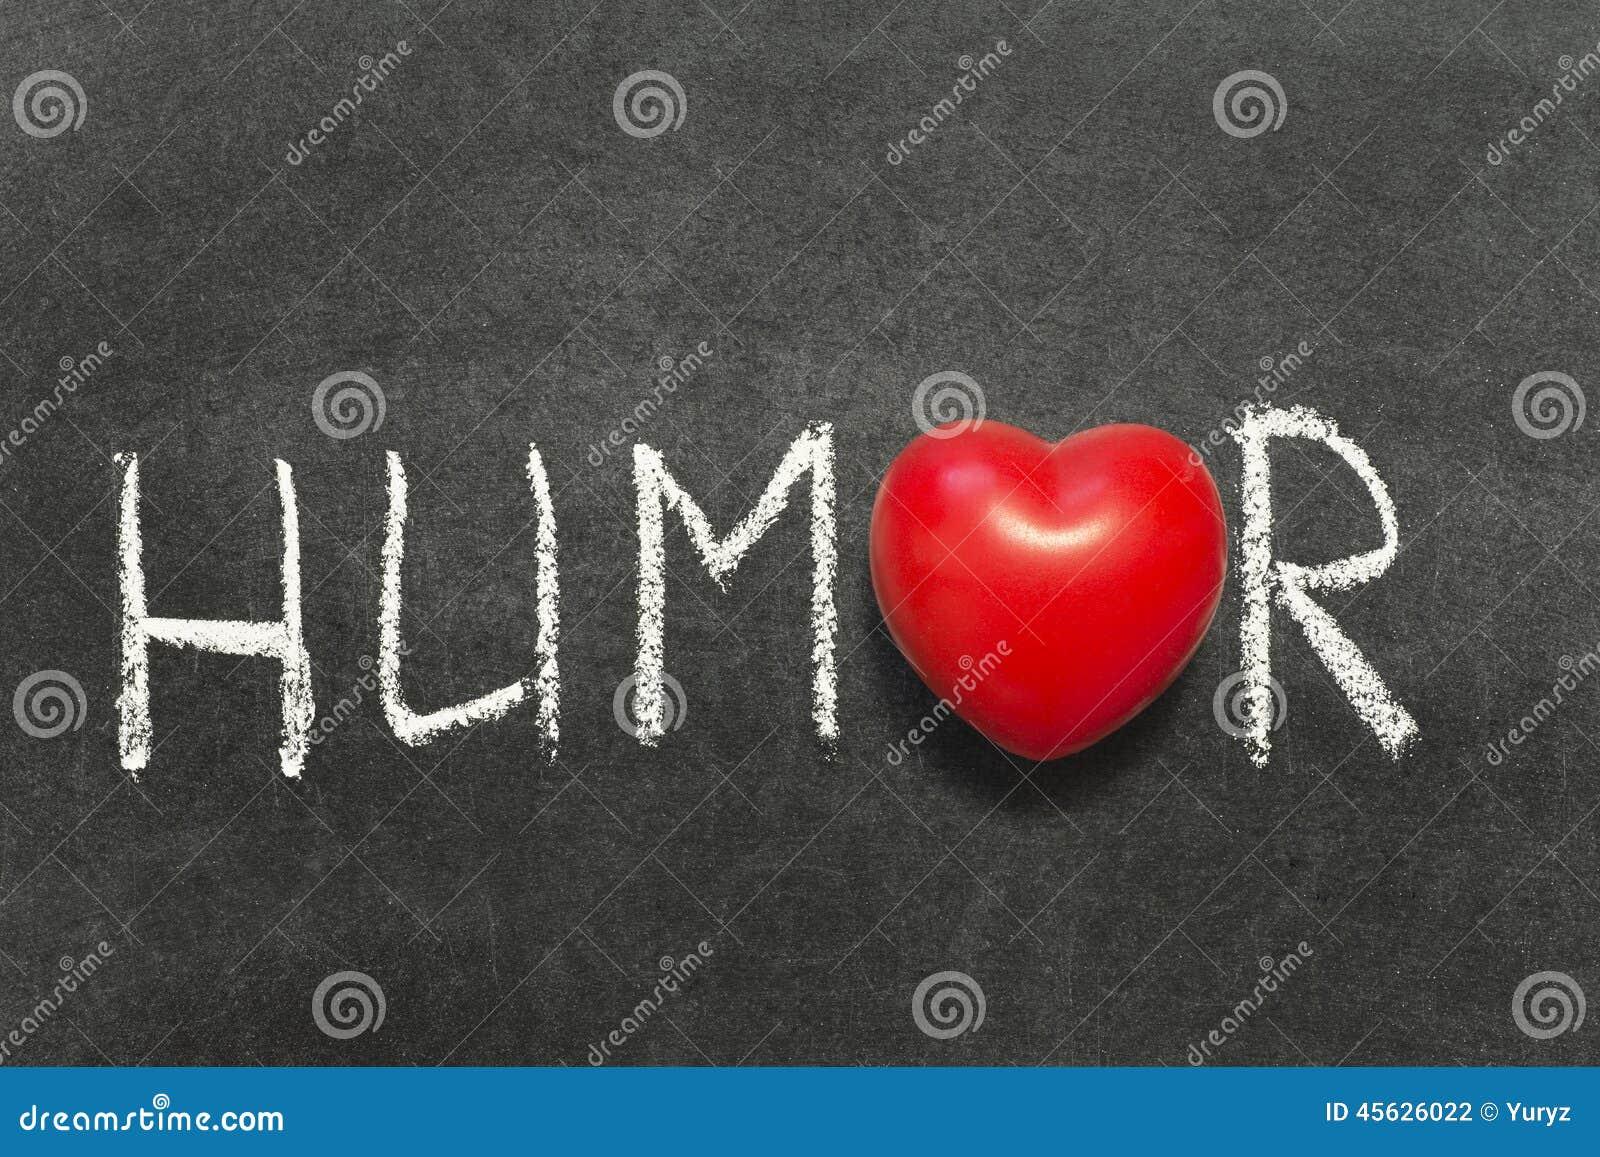 humor word symbol blackboard heart handwritten preview